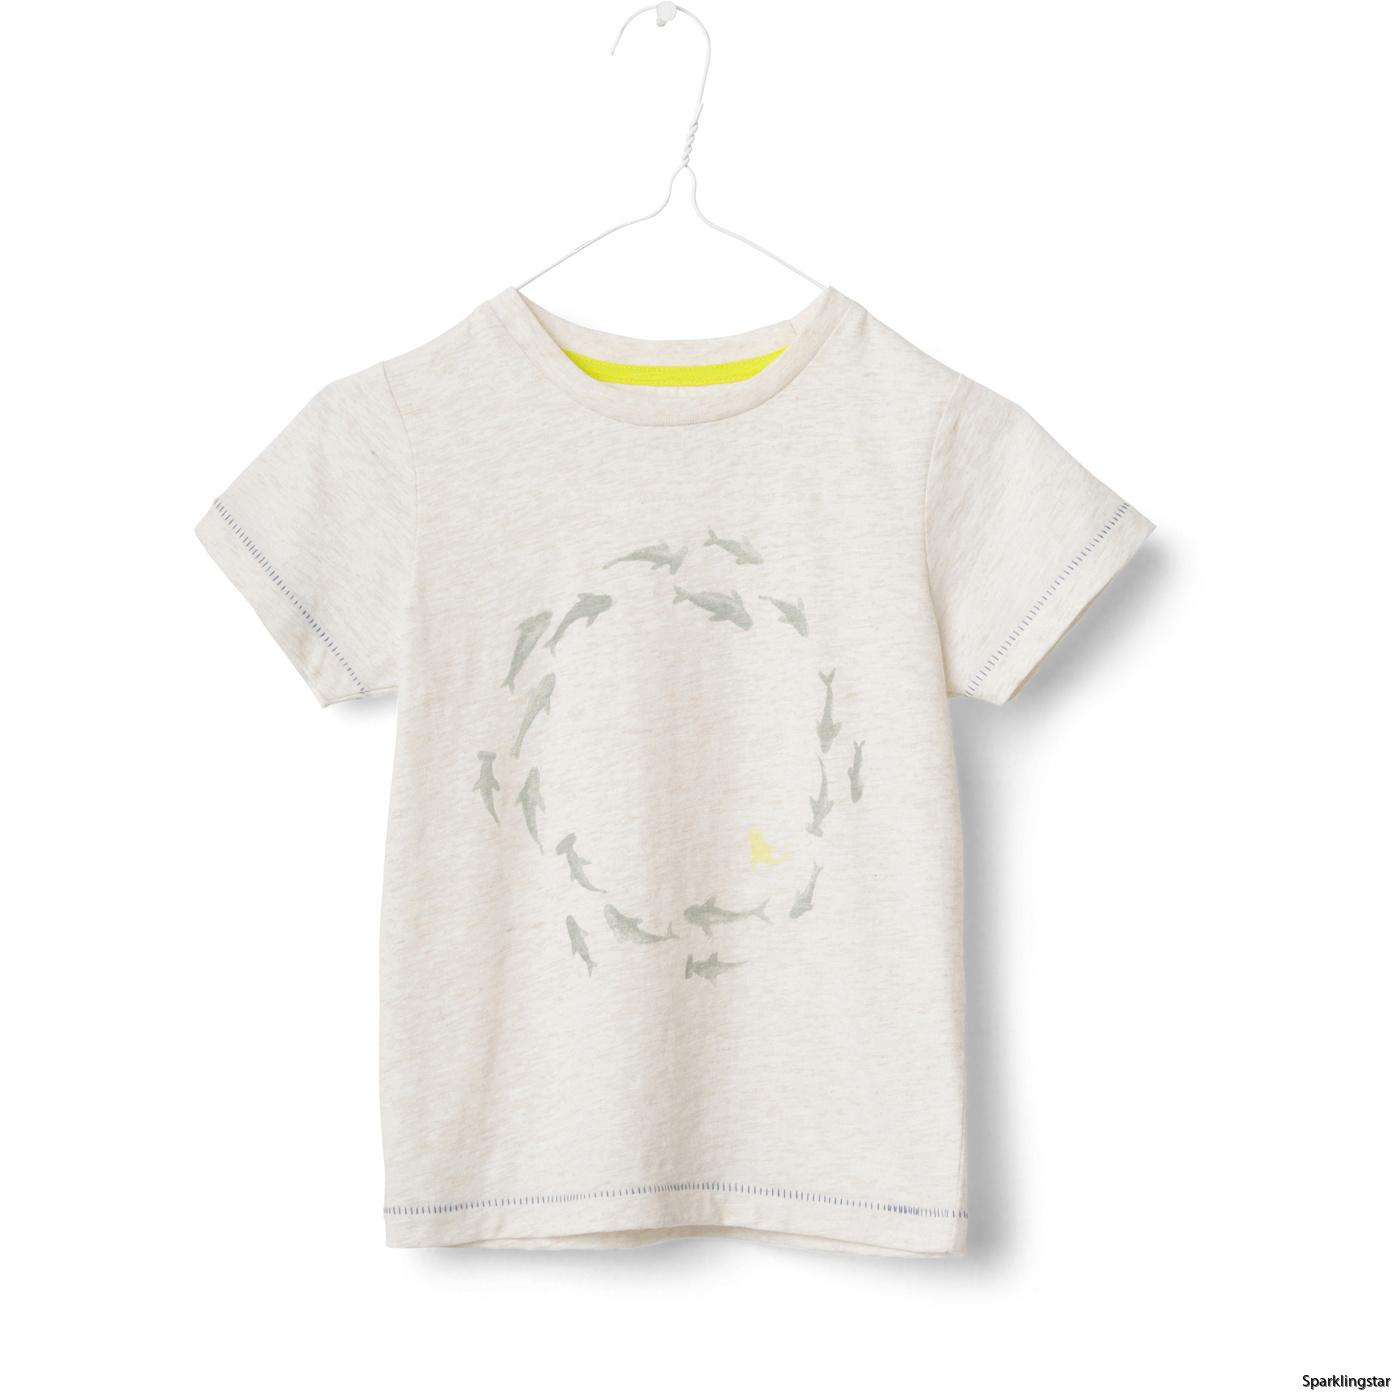 Mini A Ture Denni T-shirt